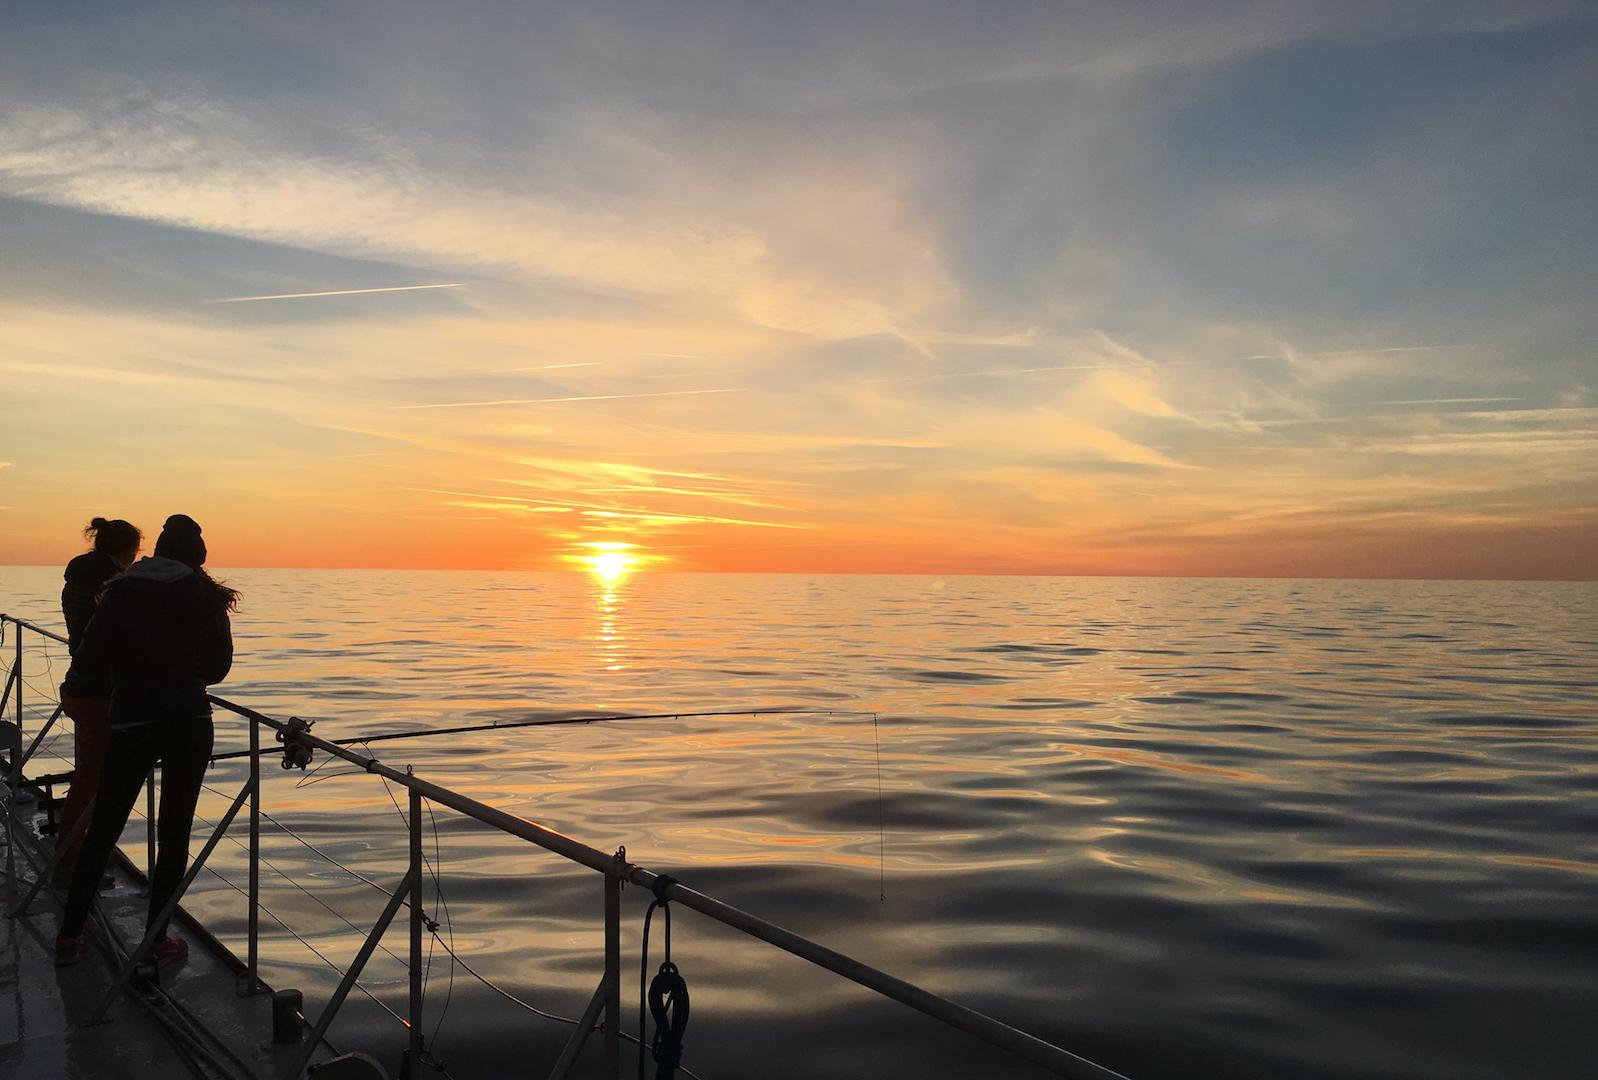 coucher de soleil en mer - navire sea explorer - terre marine